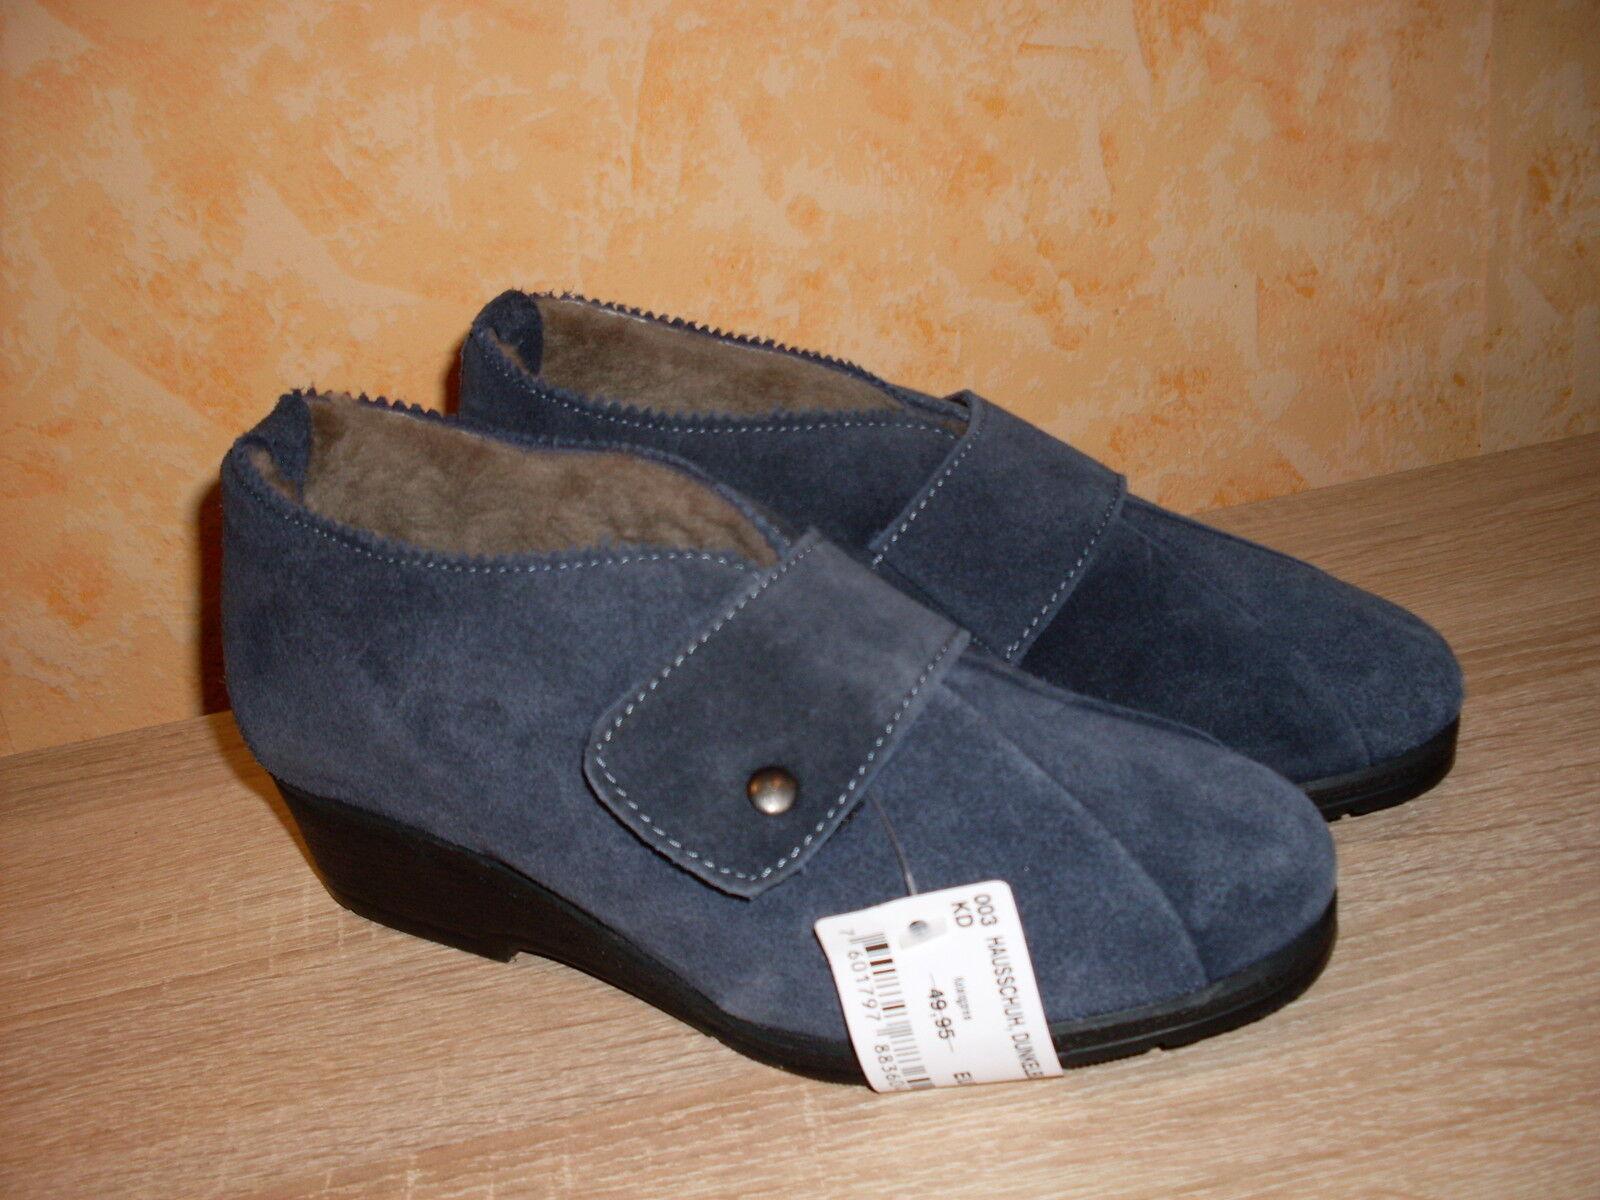 Casa zapato casa botas botas botas nuevo talla 36 en azul oscuro, gamuza cuero & cordero & velcro  buen precio